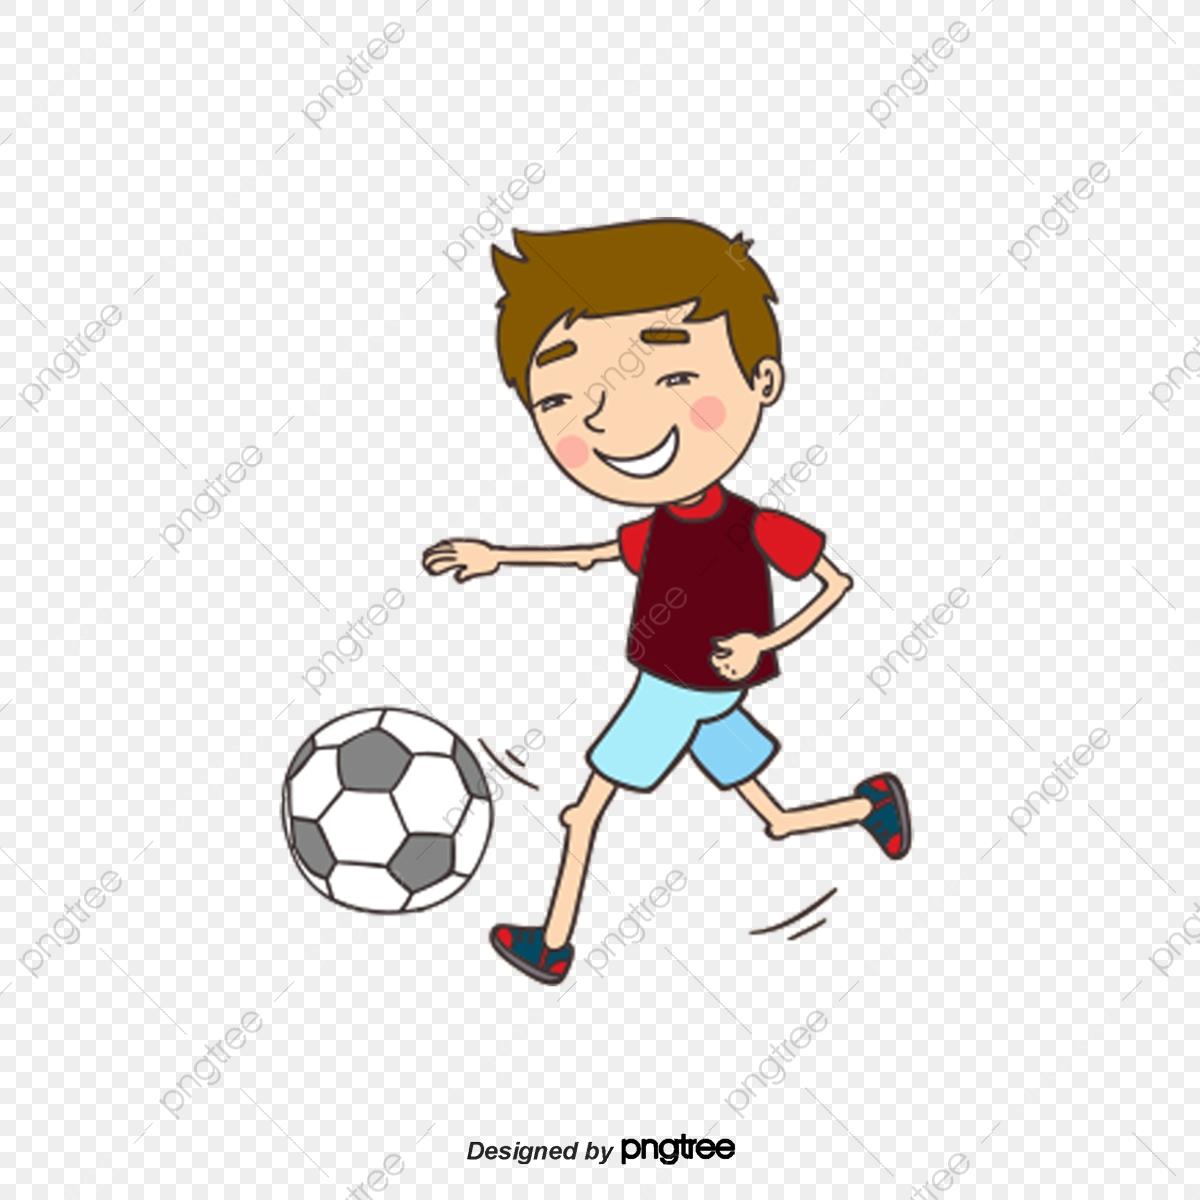 8000+ Gambar Animasi Olahraga  Terbaik